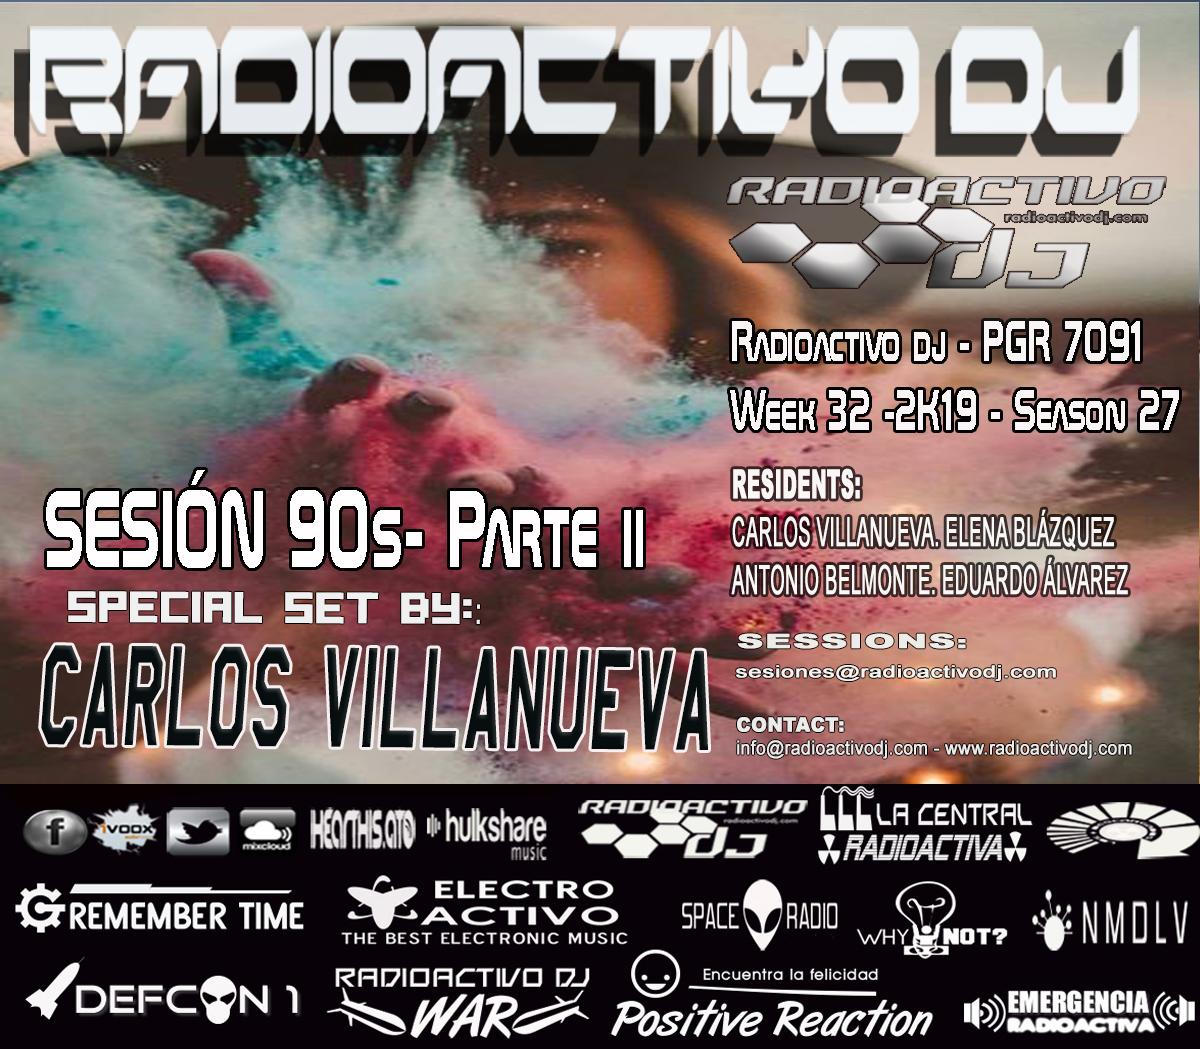 RADIOACTIVO-DJ-32-2019